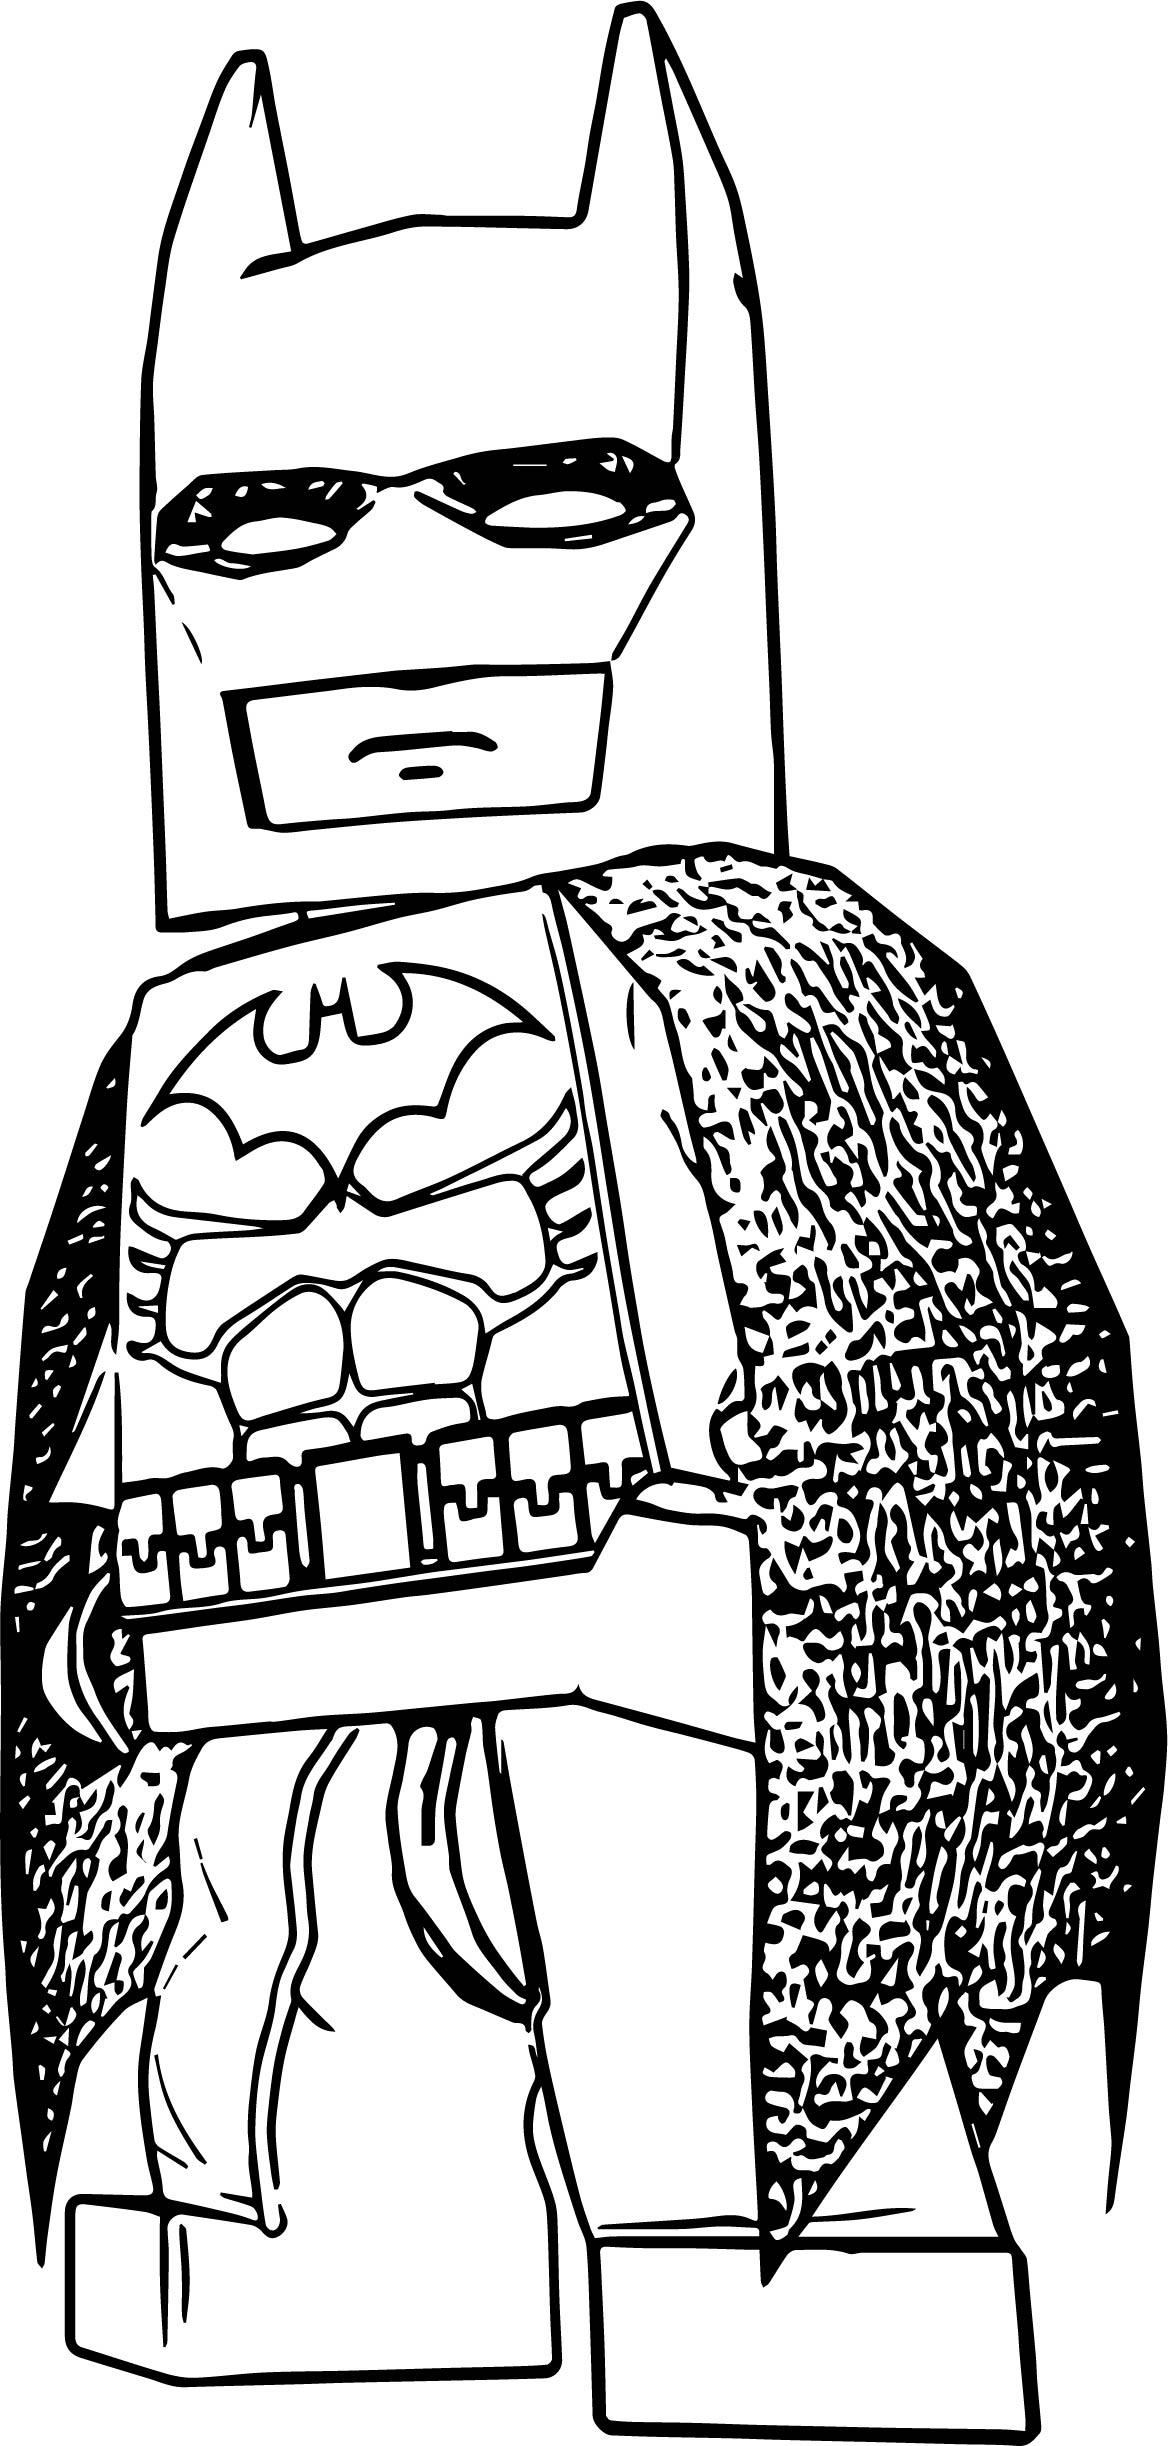 lego batman coloring pages - batman lbtvg lego coloring page